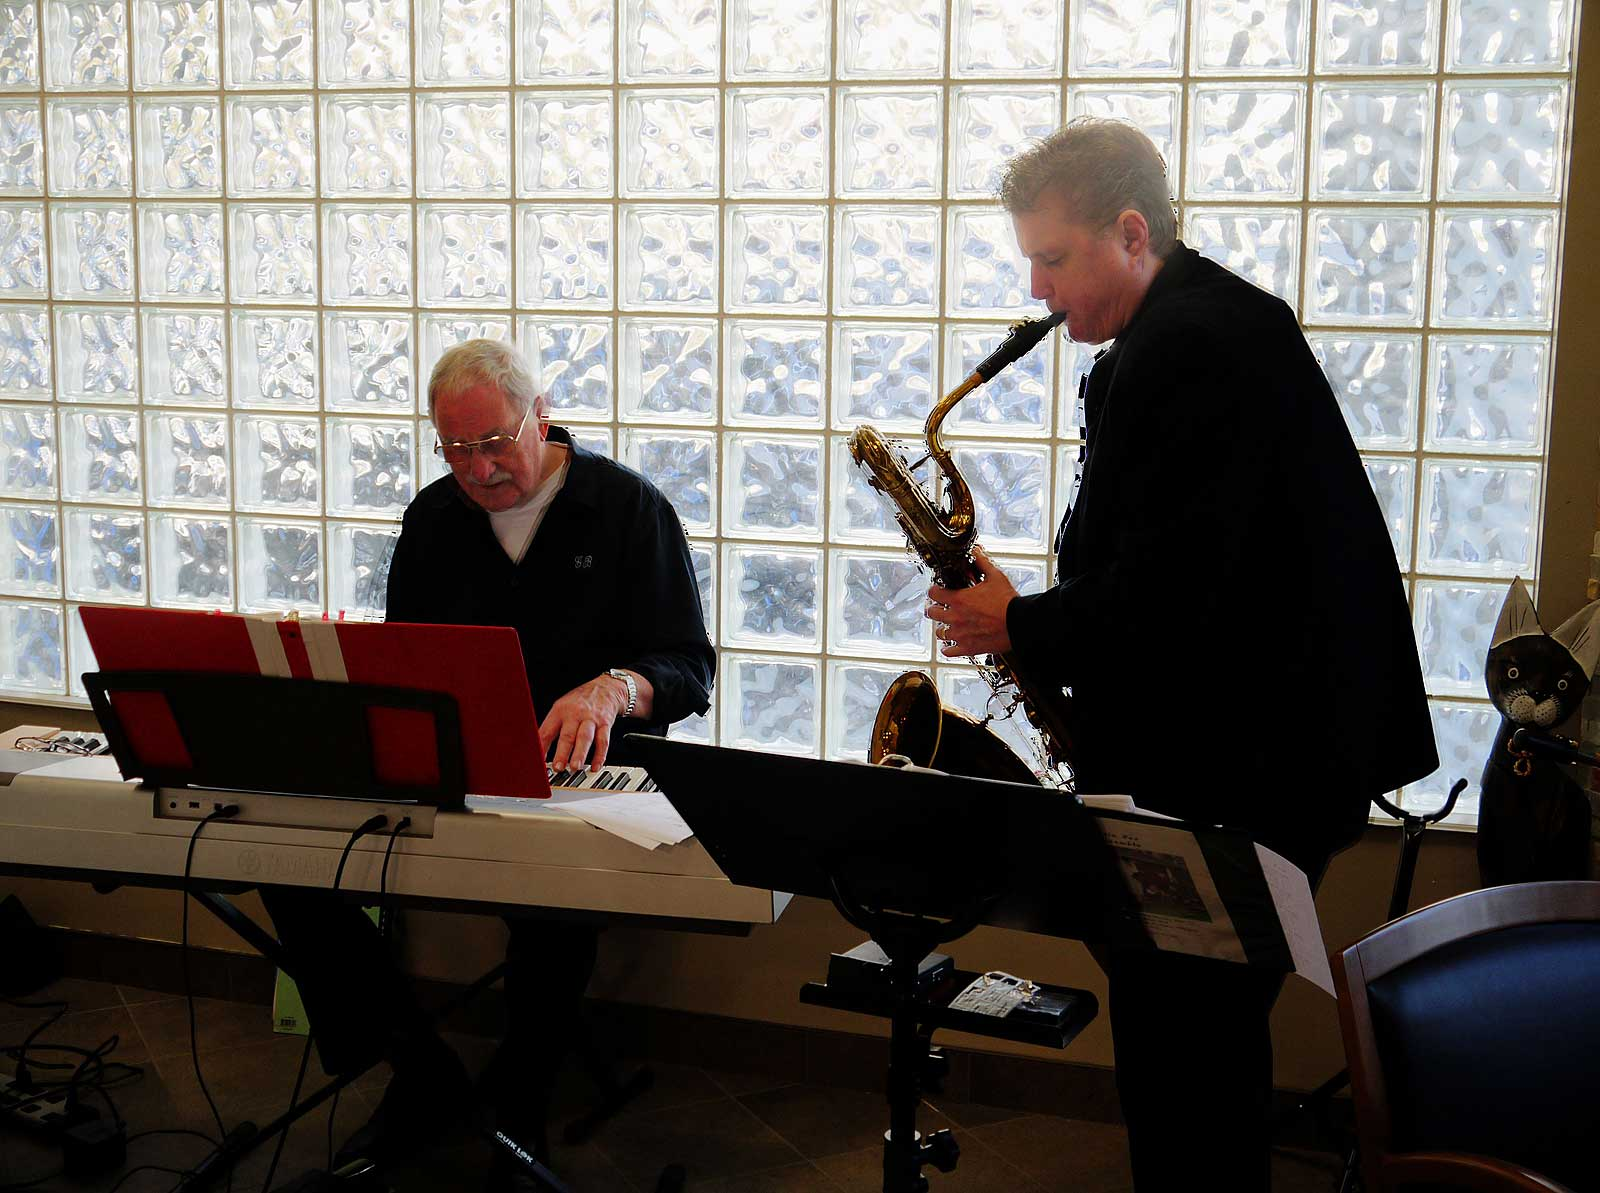 Bassic Sax Jazz Ensemble, Helen Kahlke, Geoff Brown, Coast Rivers Pet Hospital, bari sax player, keyboard player